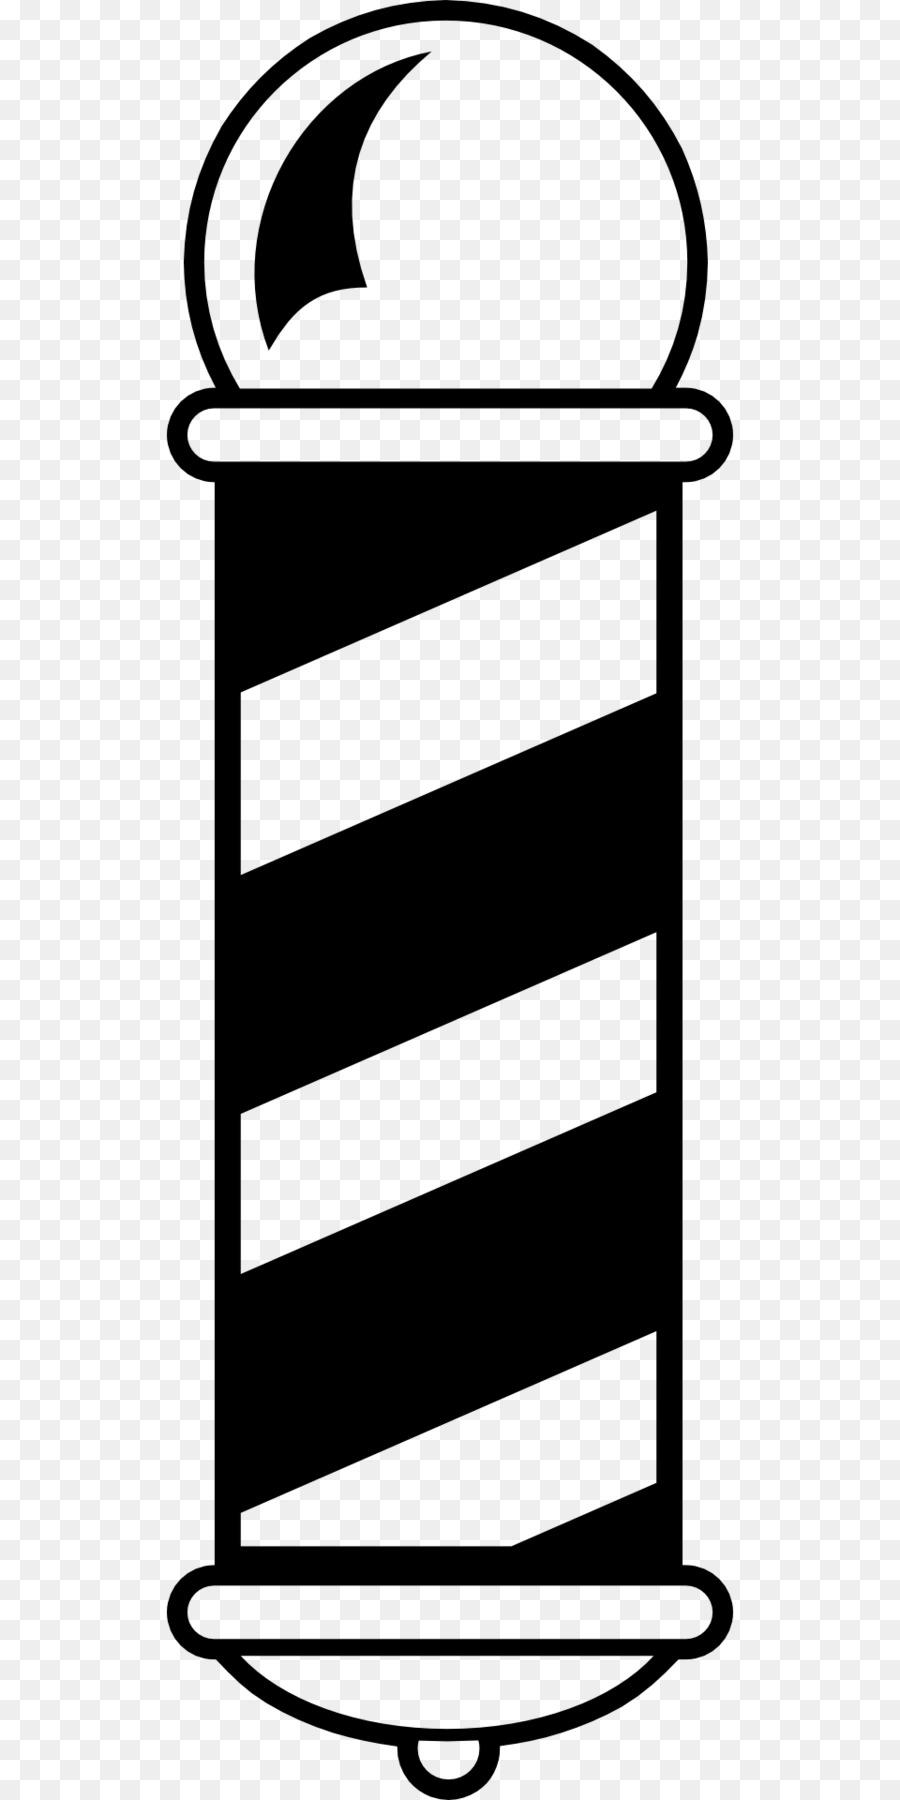 Barber clipart transparent. S pole clip art